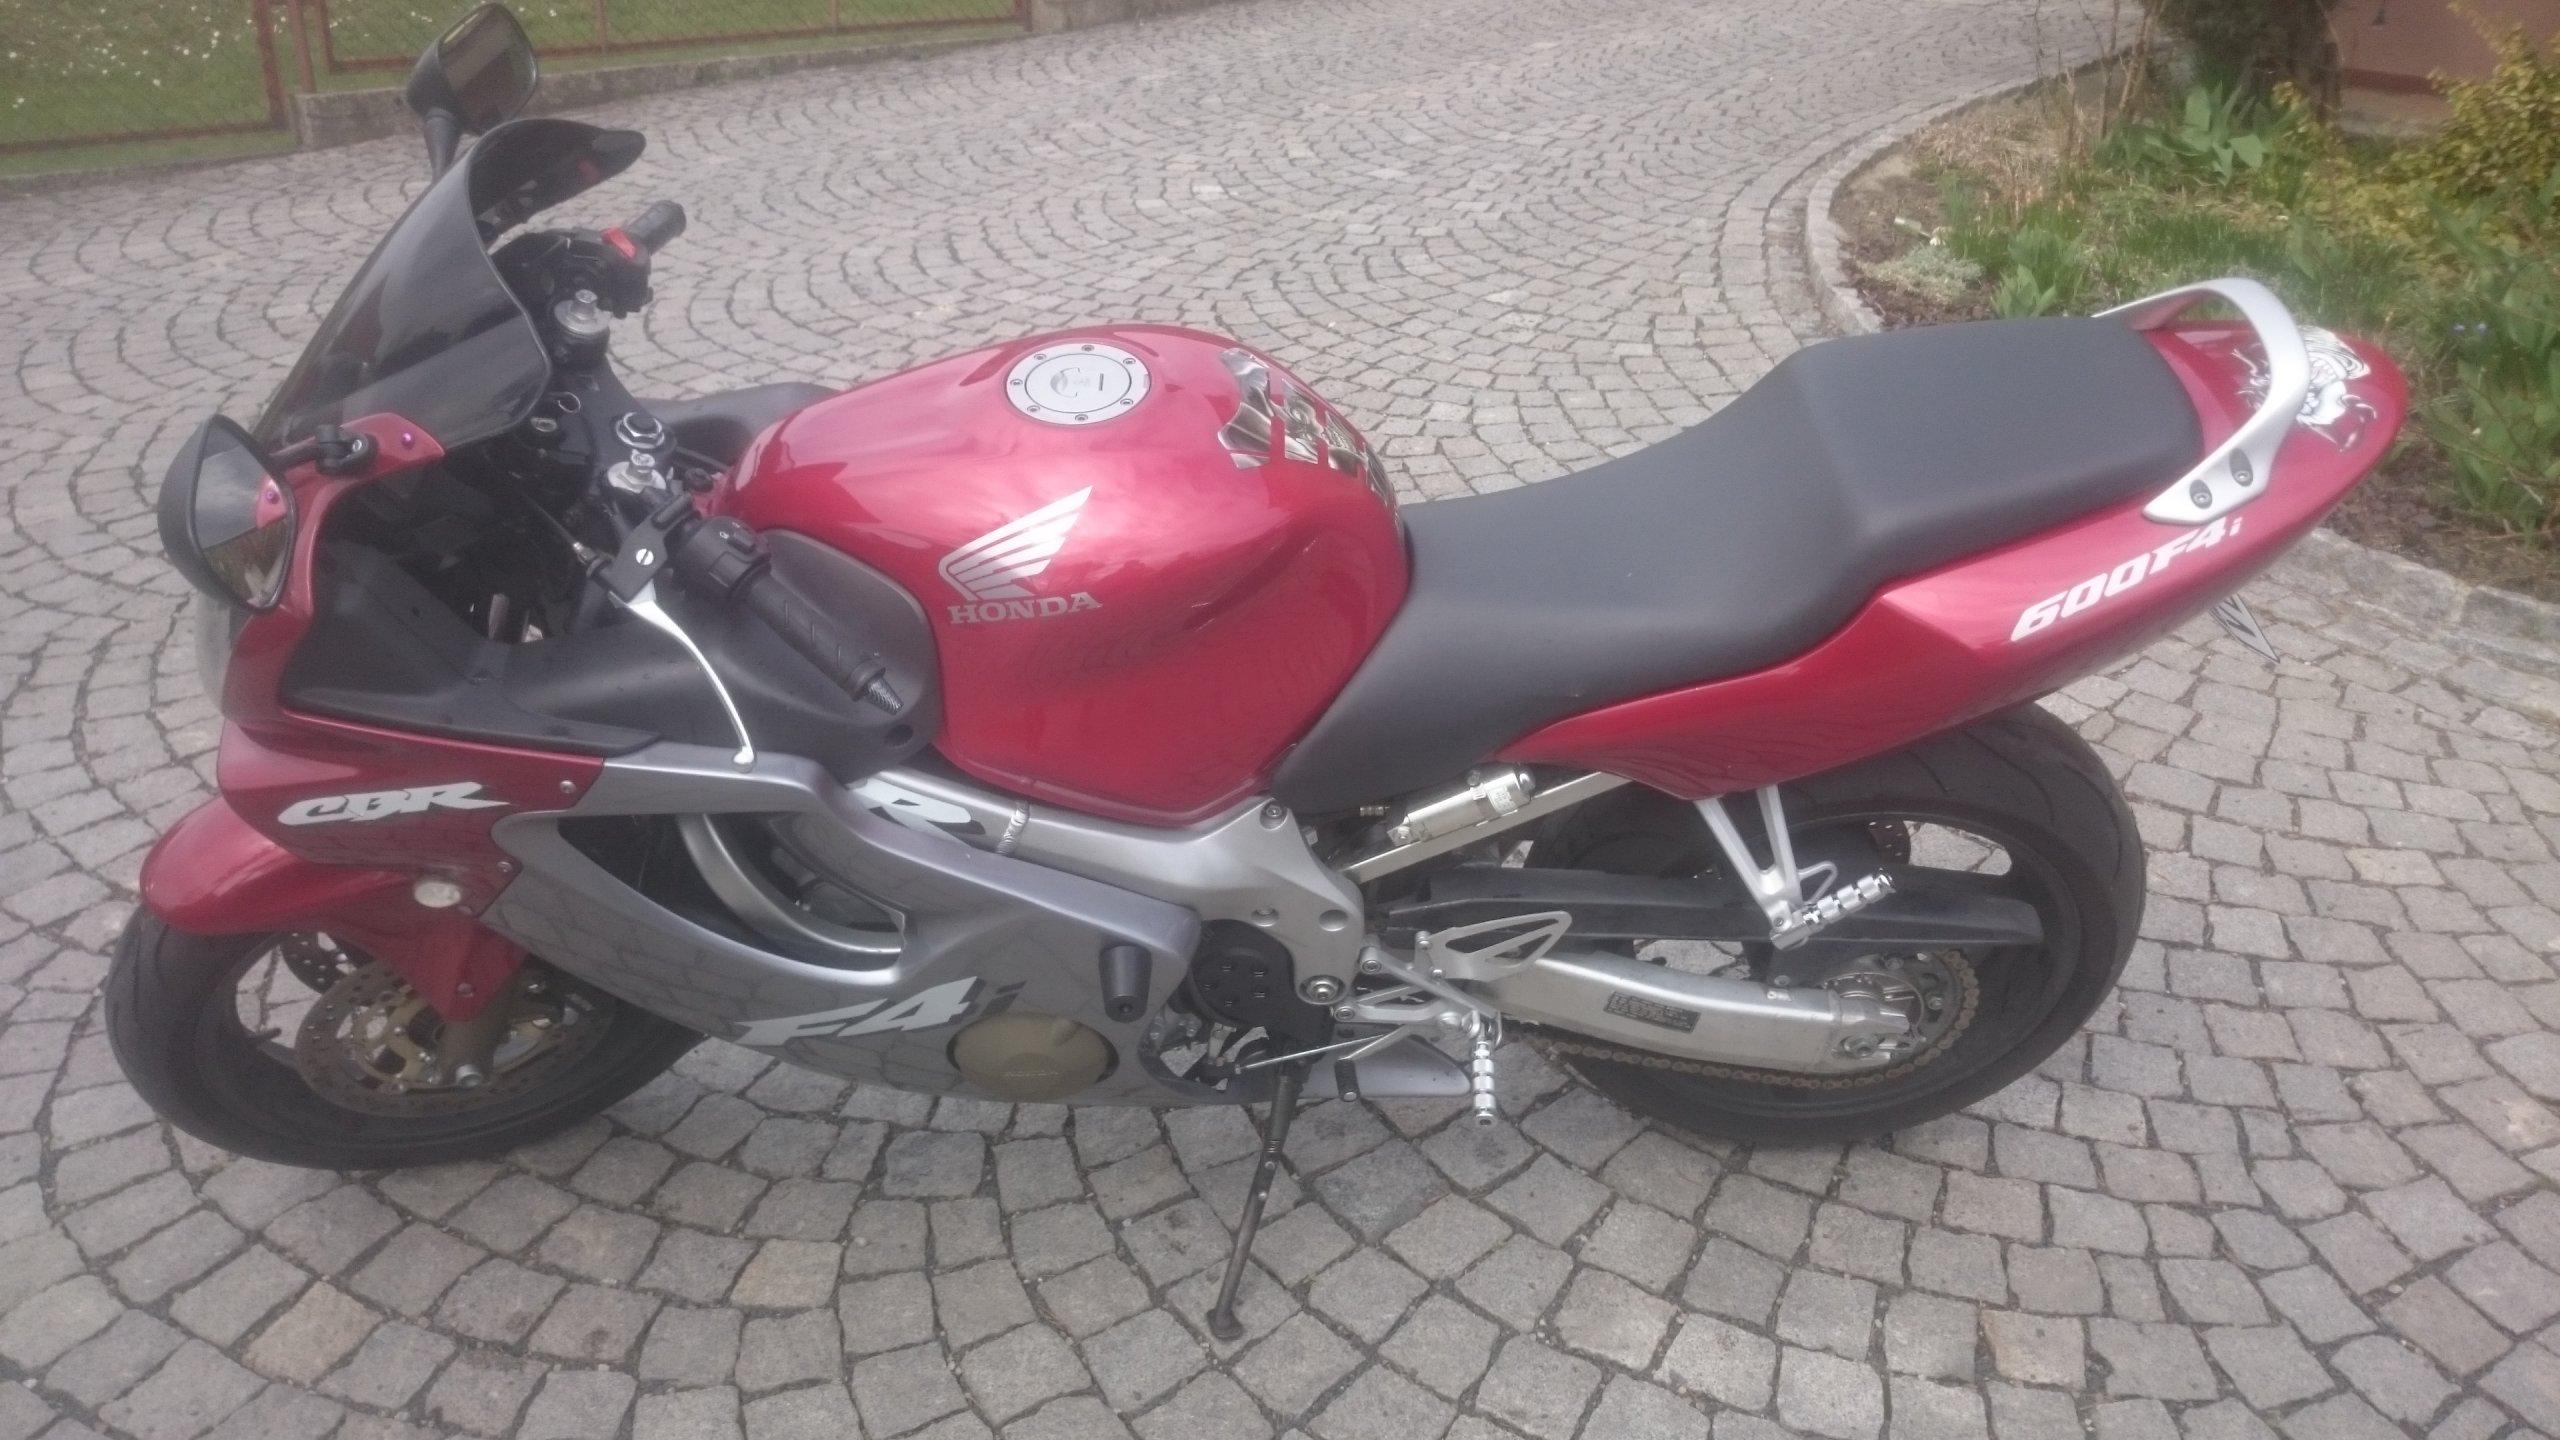 Honda Cbr 600 F4i Xenon Led 2005 109 Km Stan Bdb 7458085126